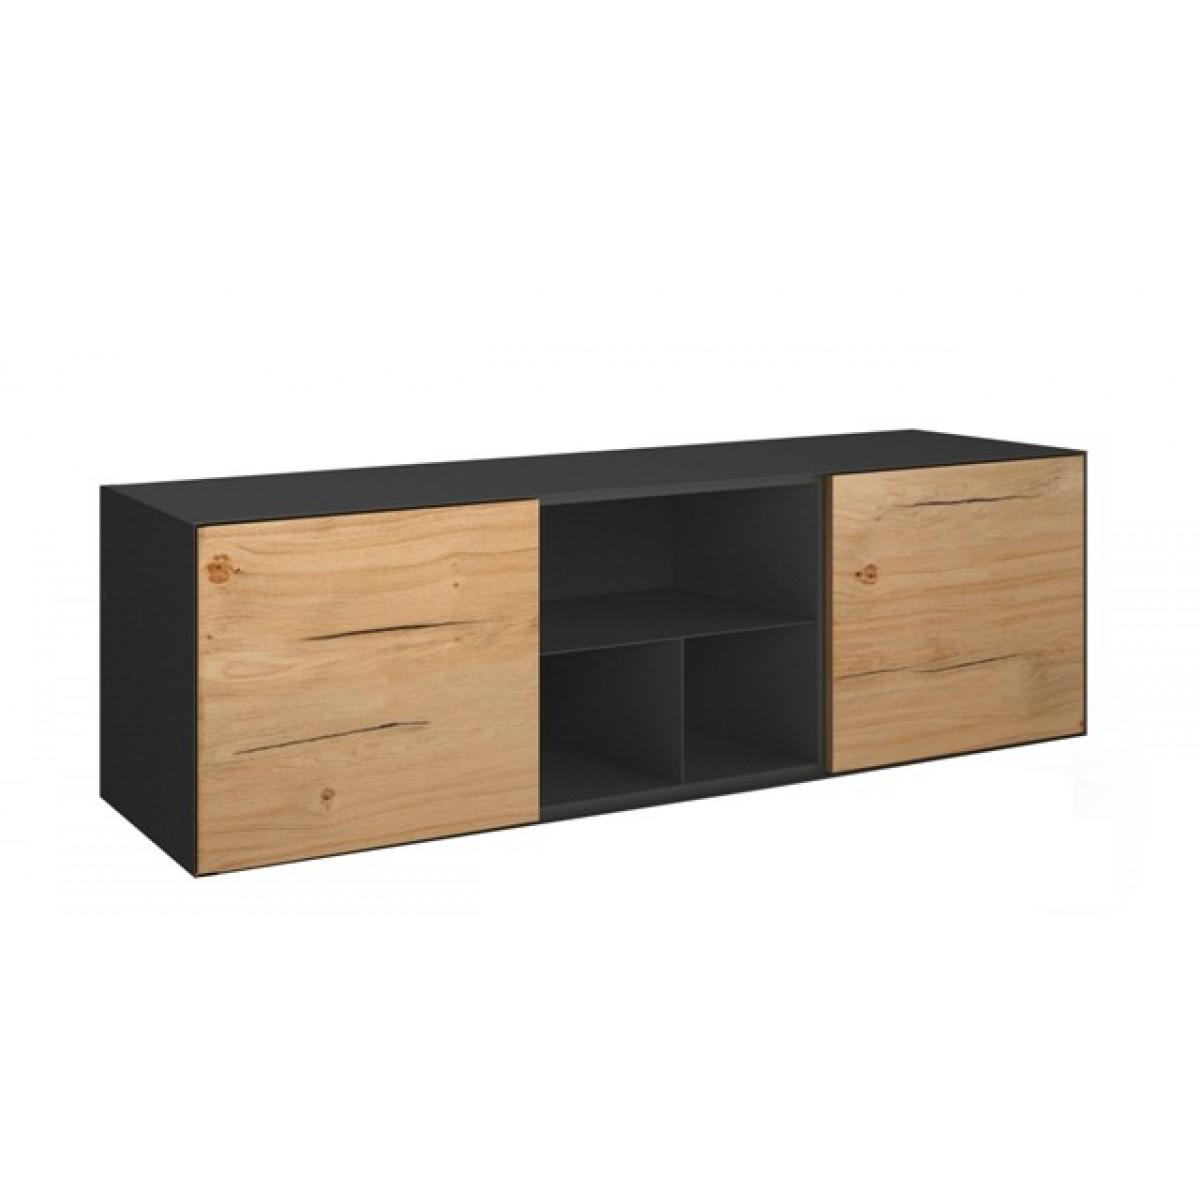 dressoir-brooklyn-hangend-eiken-metaal-mintjens-furniture-BR5_S2-miltonhouse-vrij